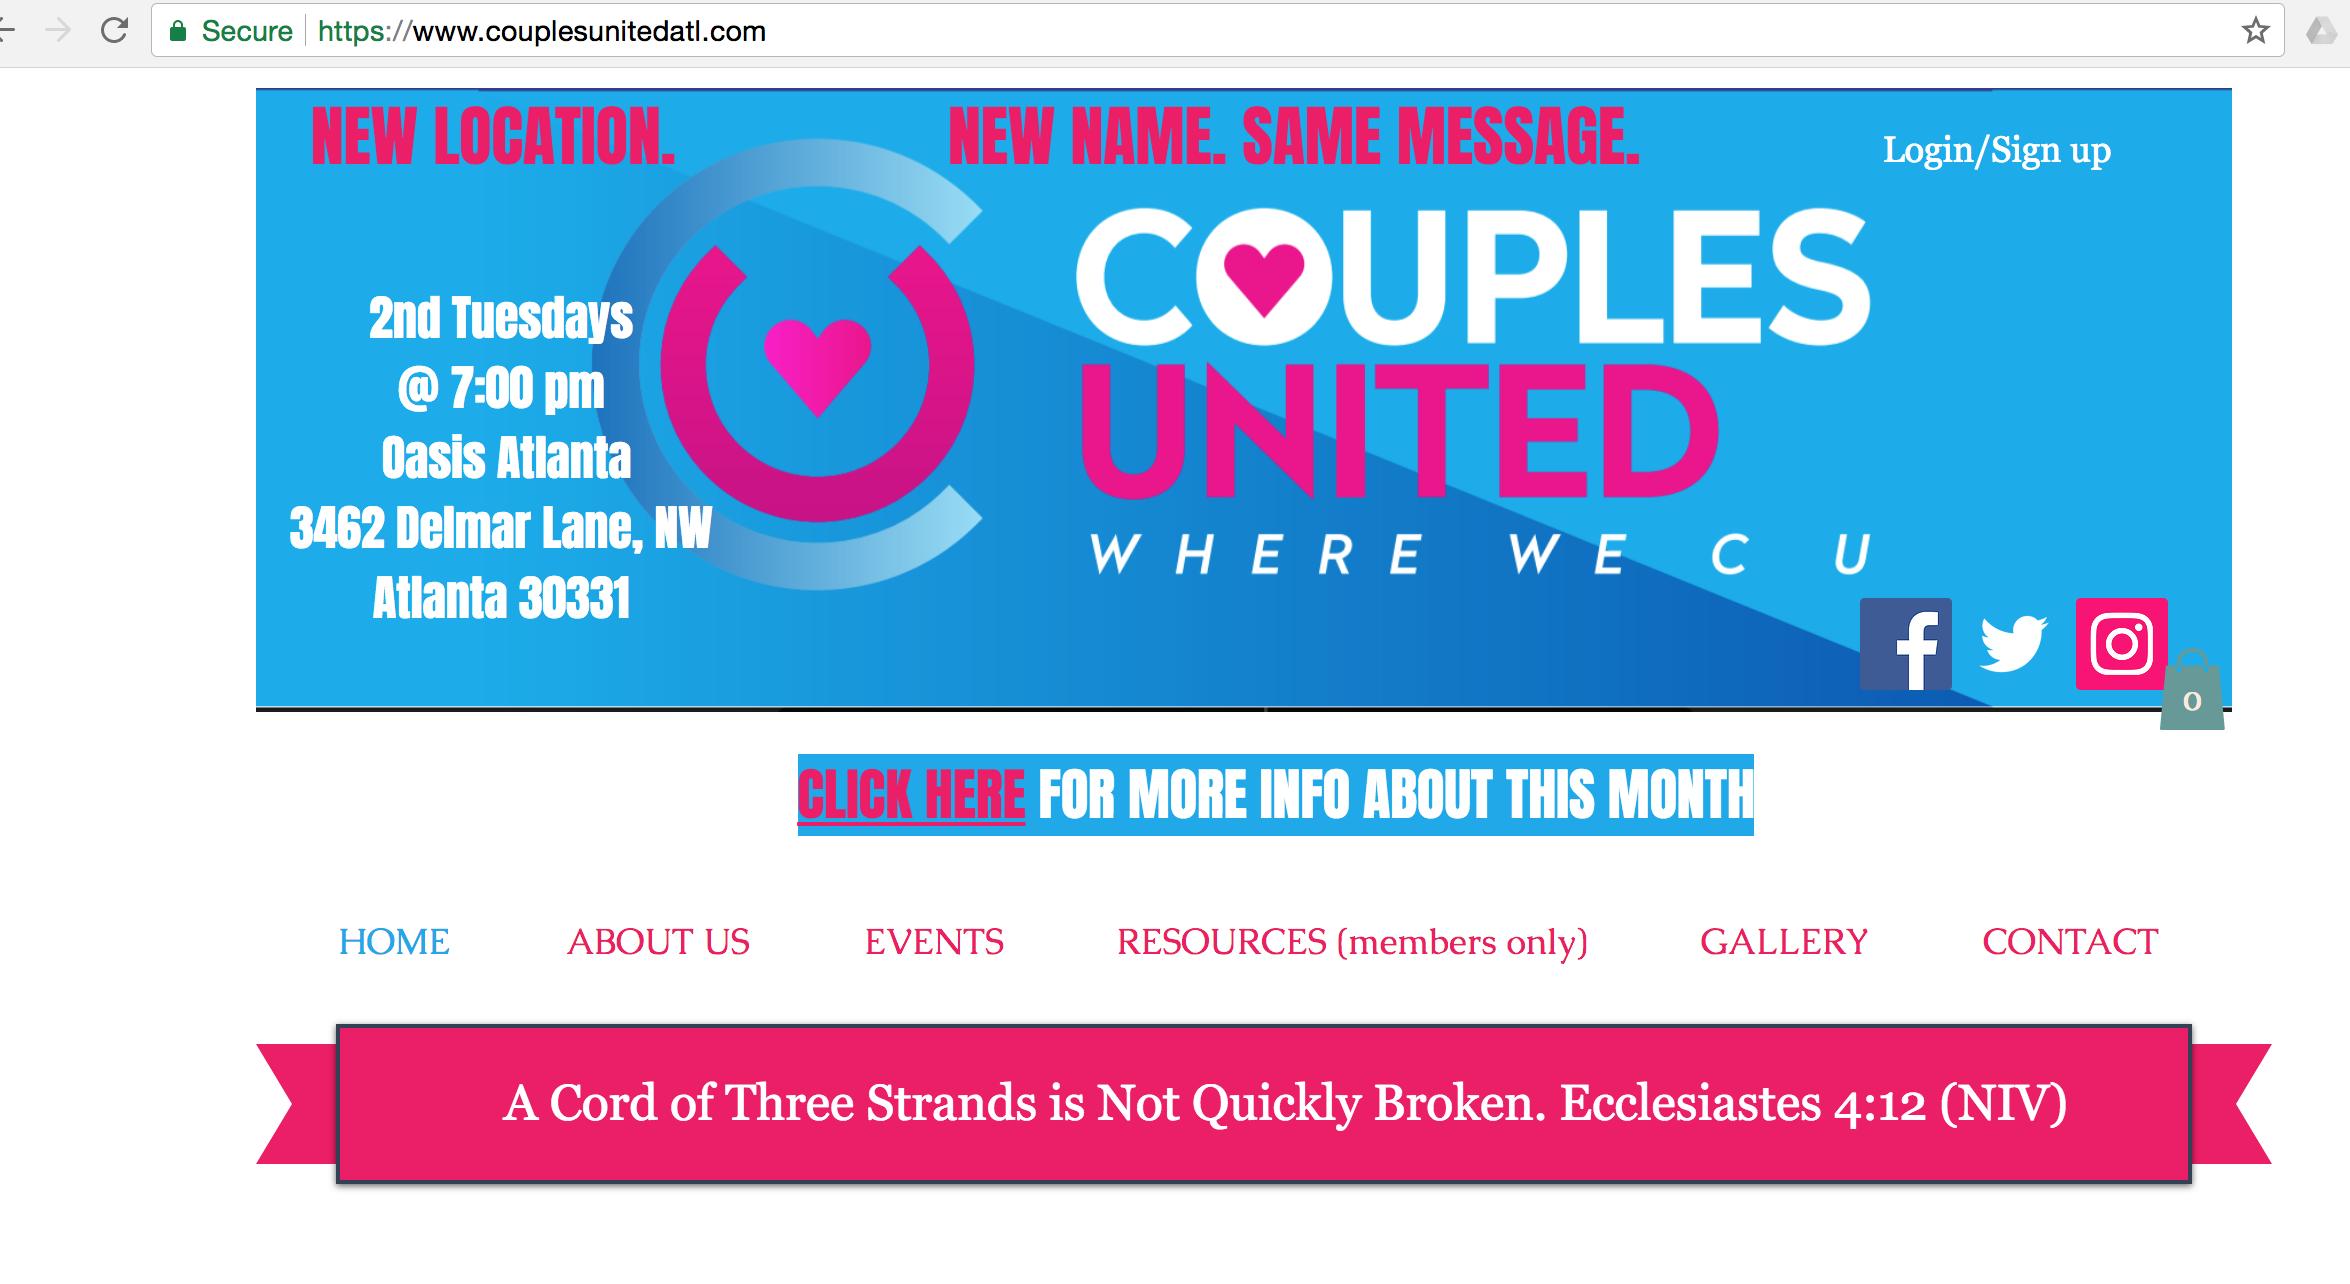 www.couplesunitedatl.com